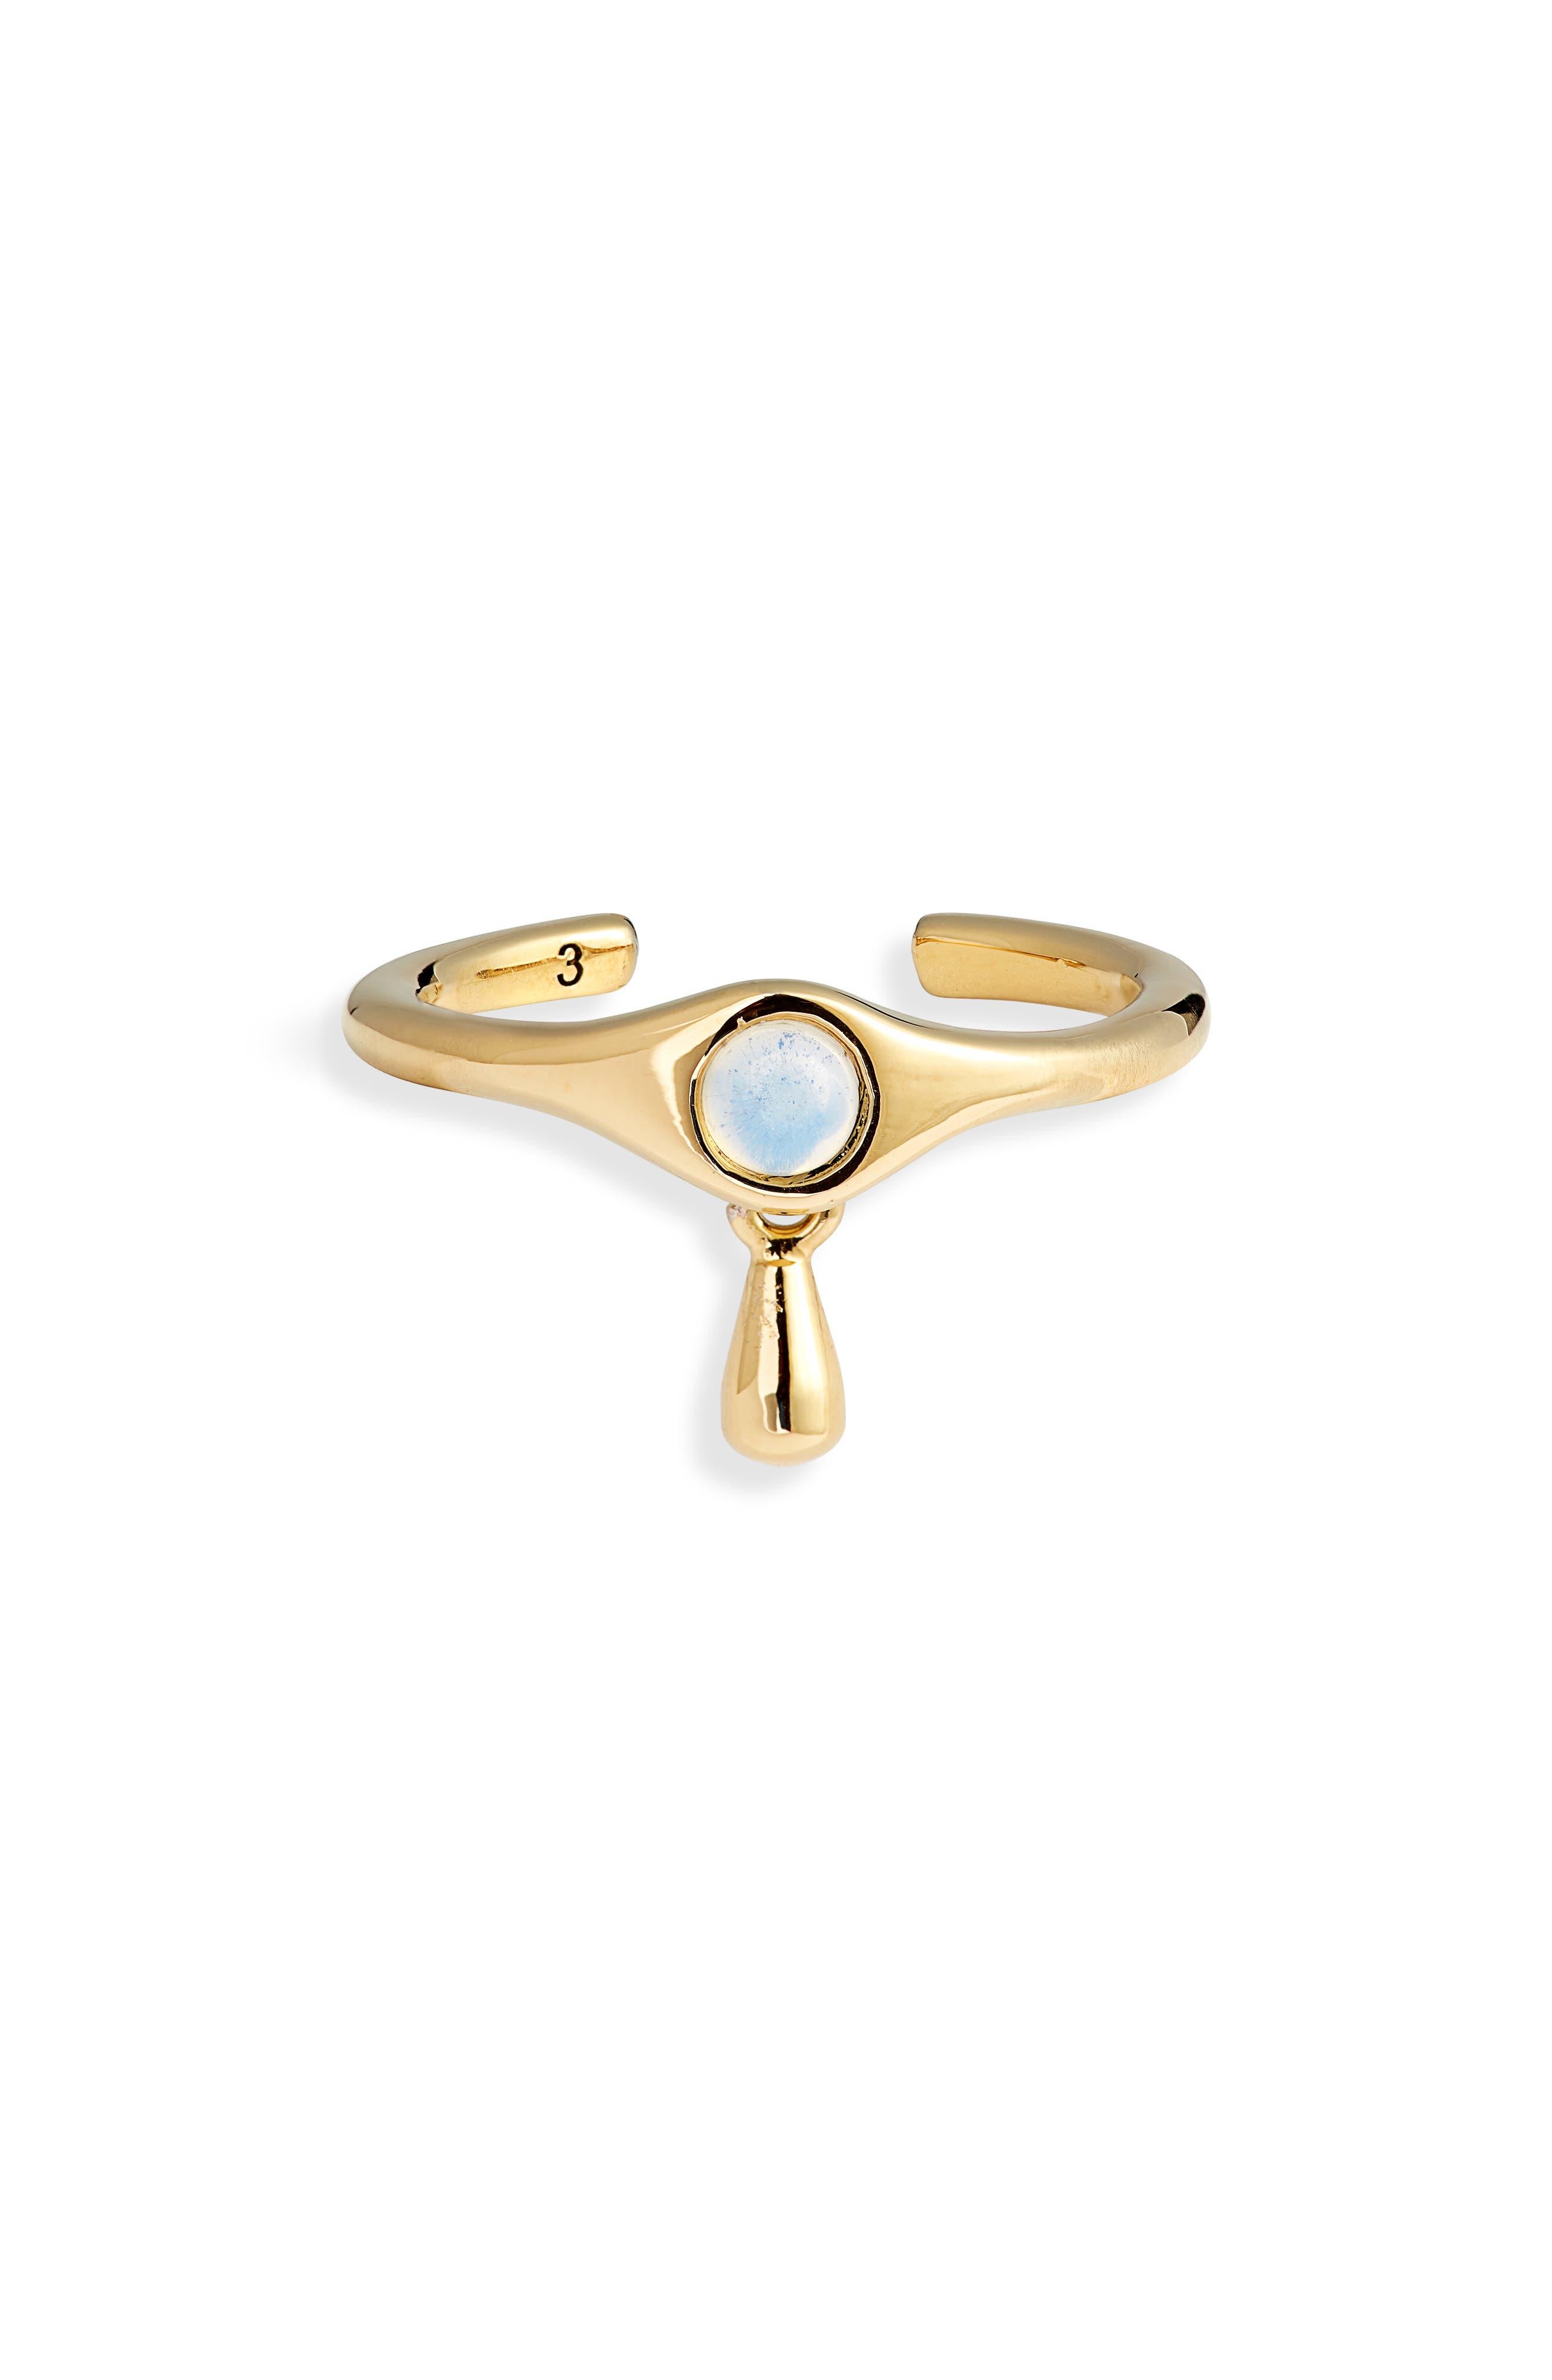 Denni Open Signet Ring